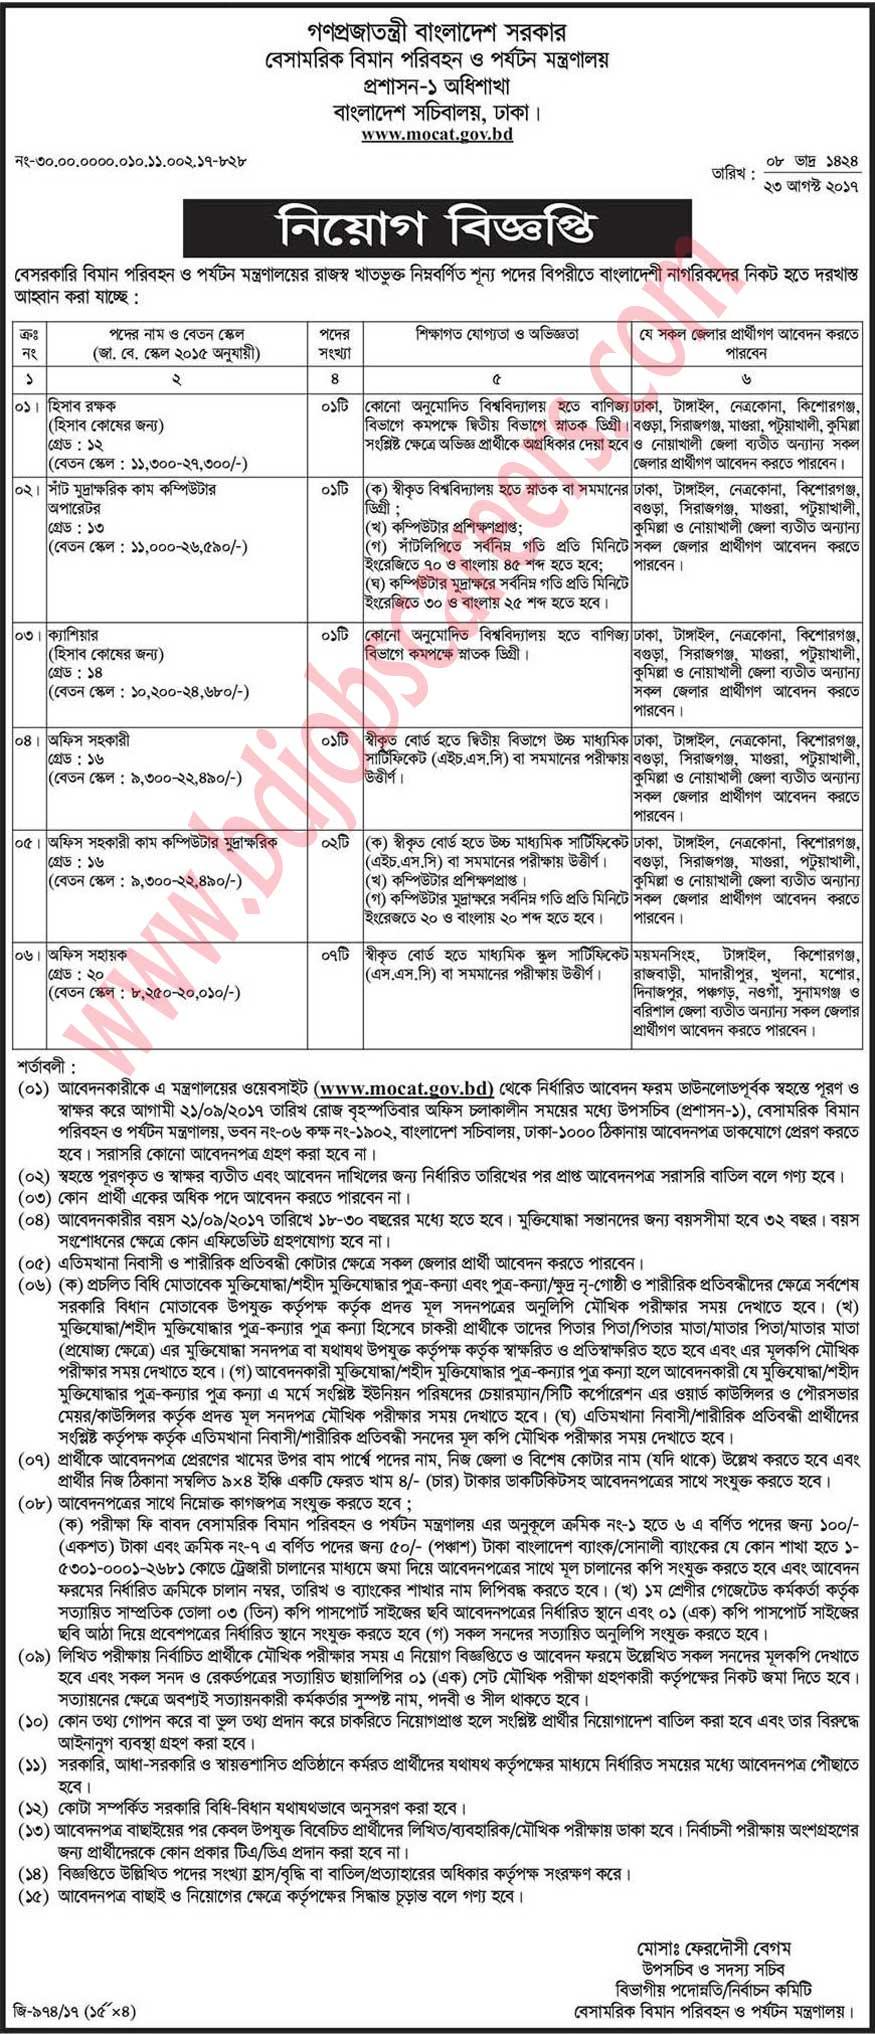 Ministry of Civil Aviation and Tourism Job Circular 2017